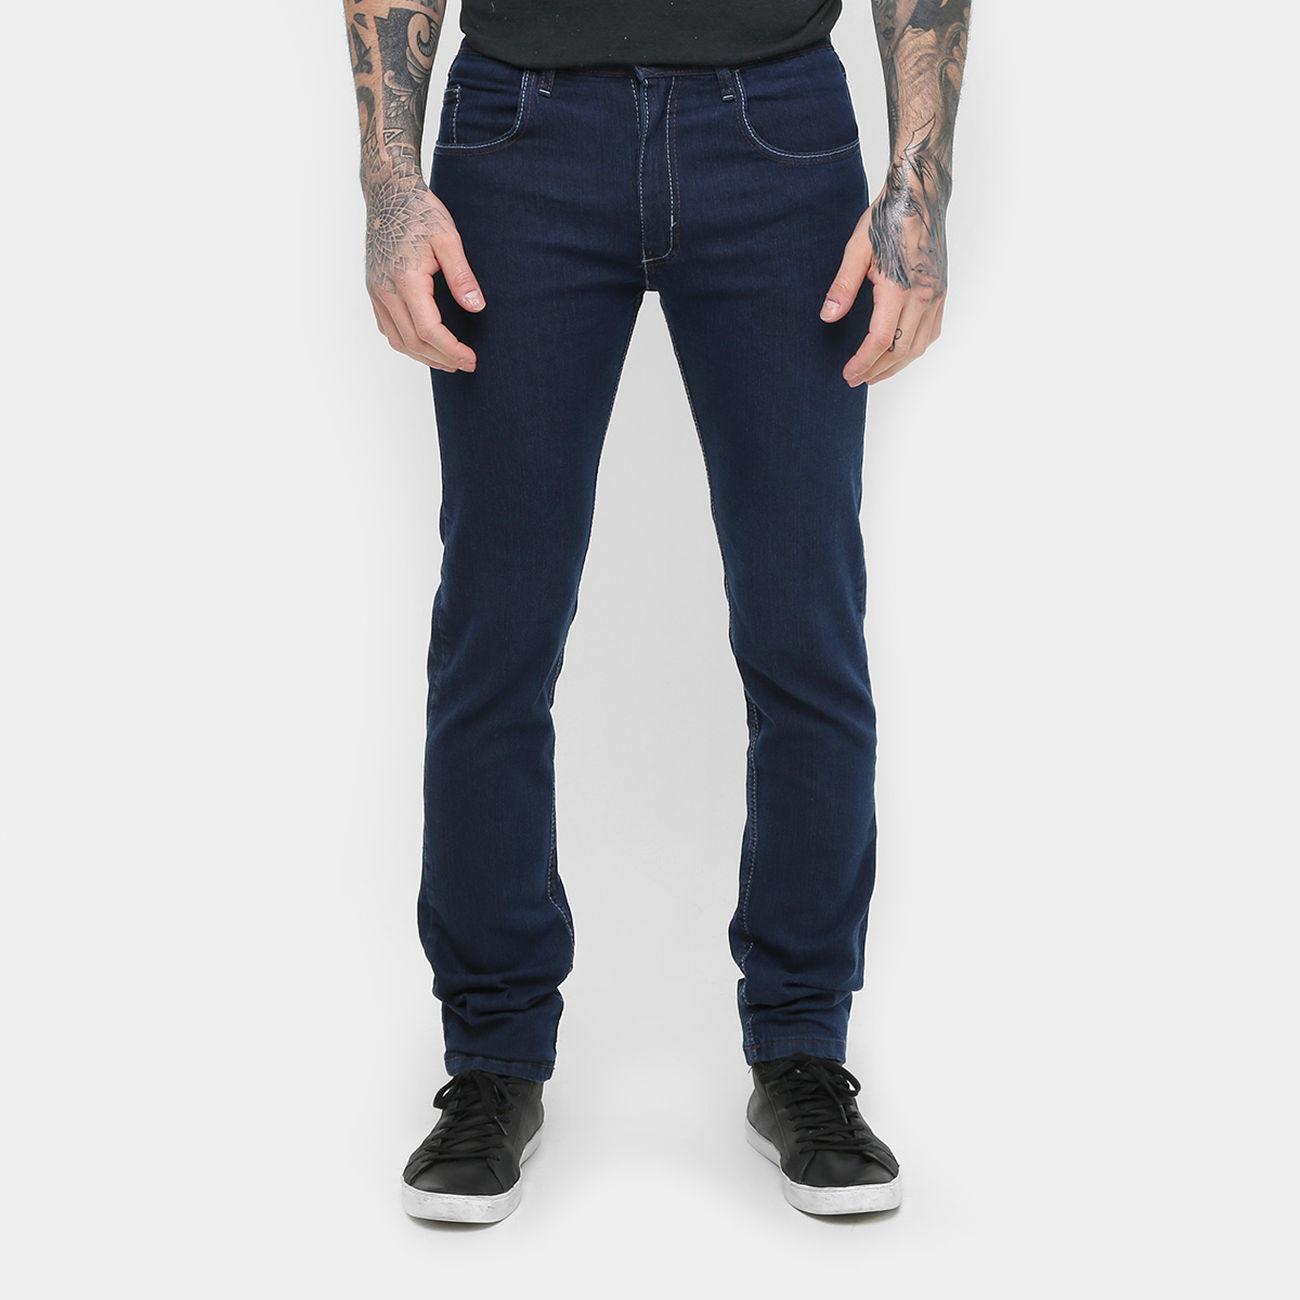 calcajeabs - Calça Jeans Skinny - R$41,90